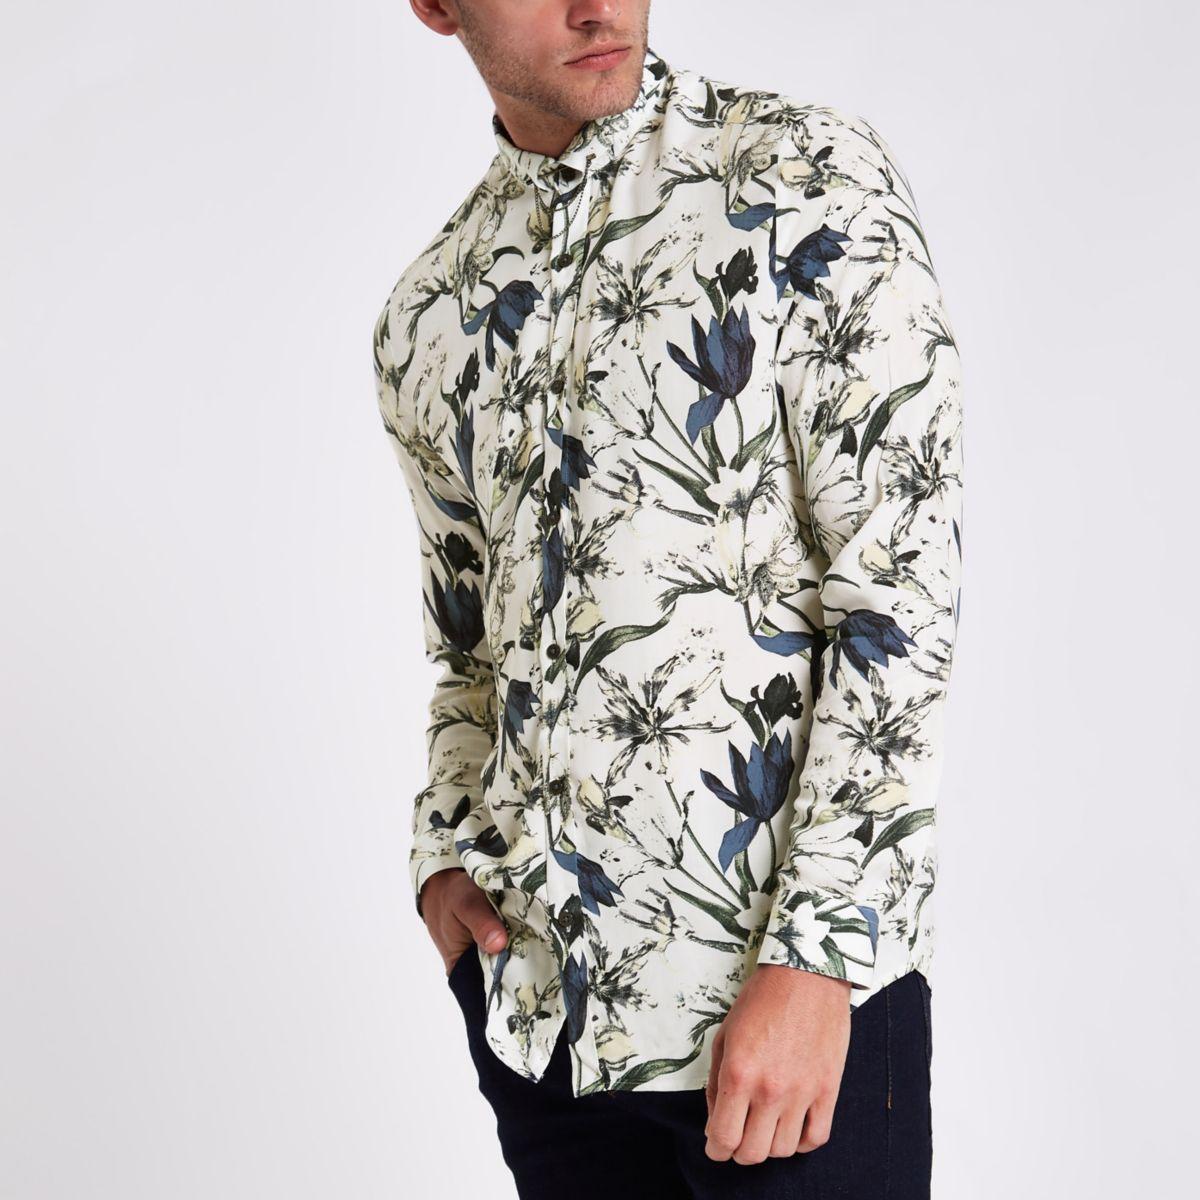 Ecru Floral Slim Fit Long Sleeve Shirt                                  Ecru Floral Slim Fit Long Sleeve Shirt by River Island